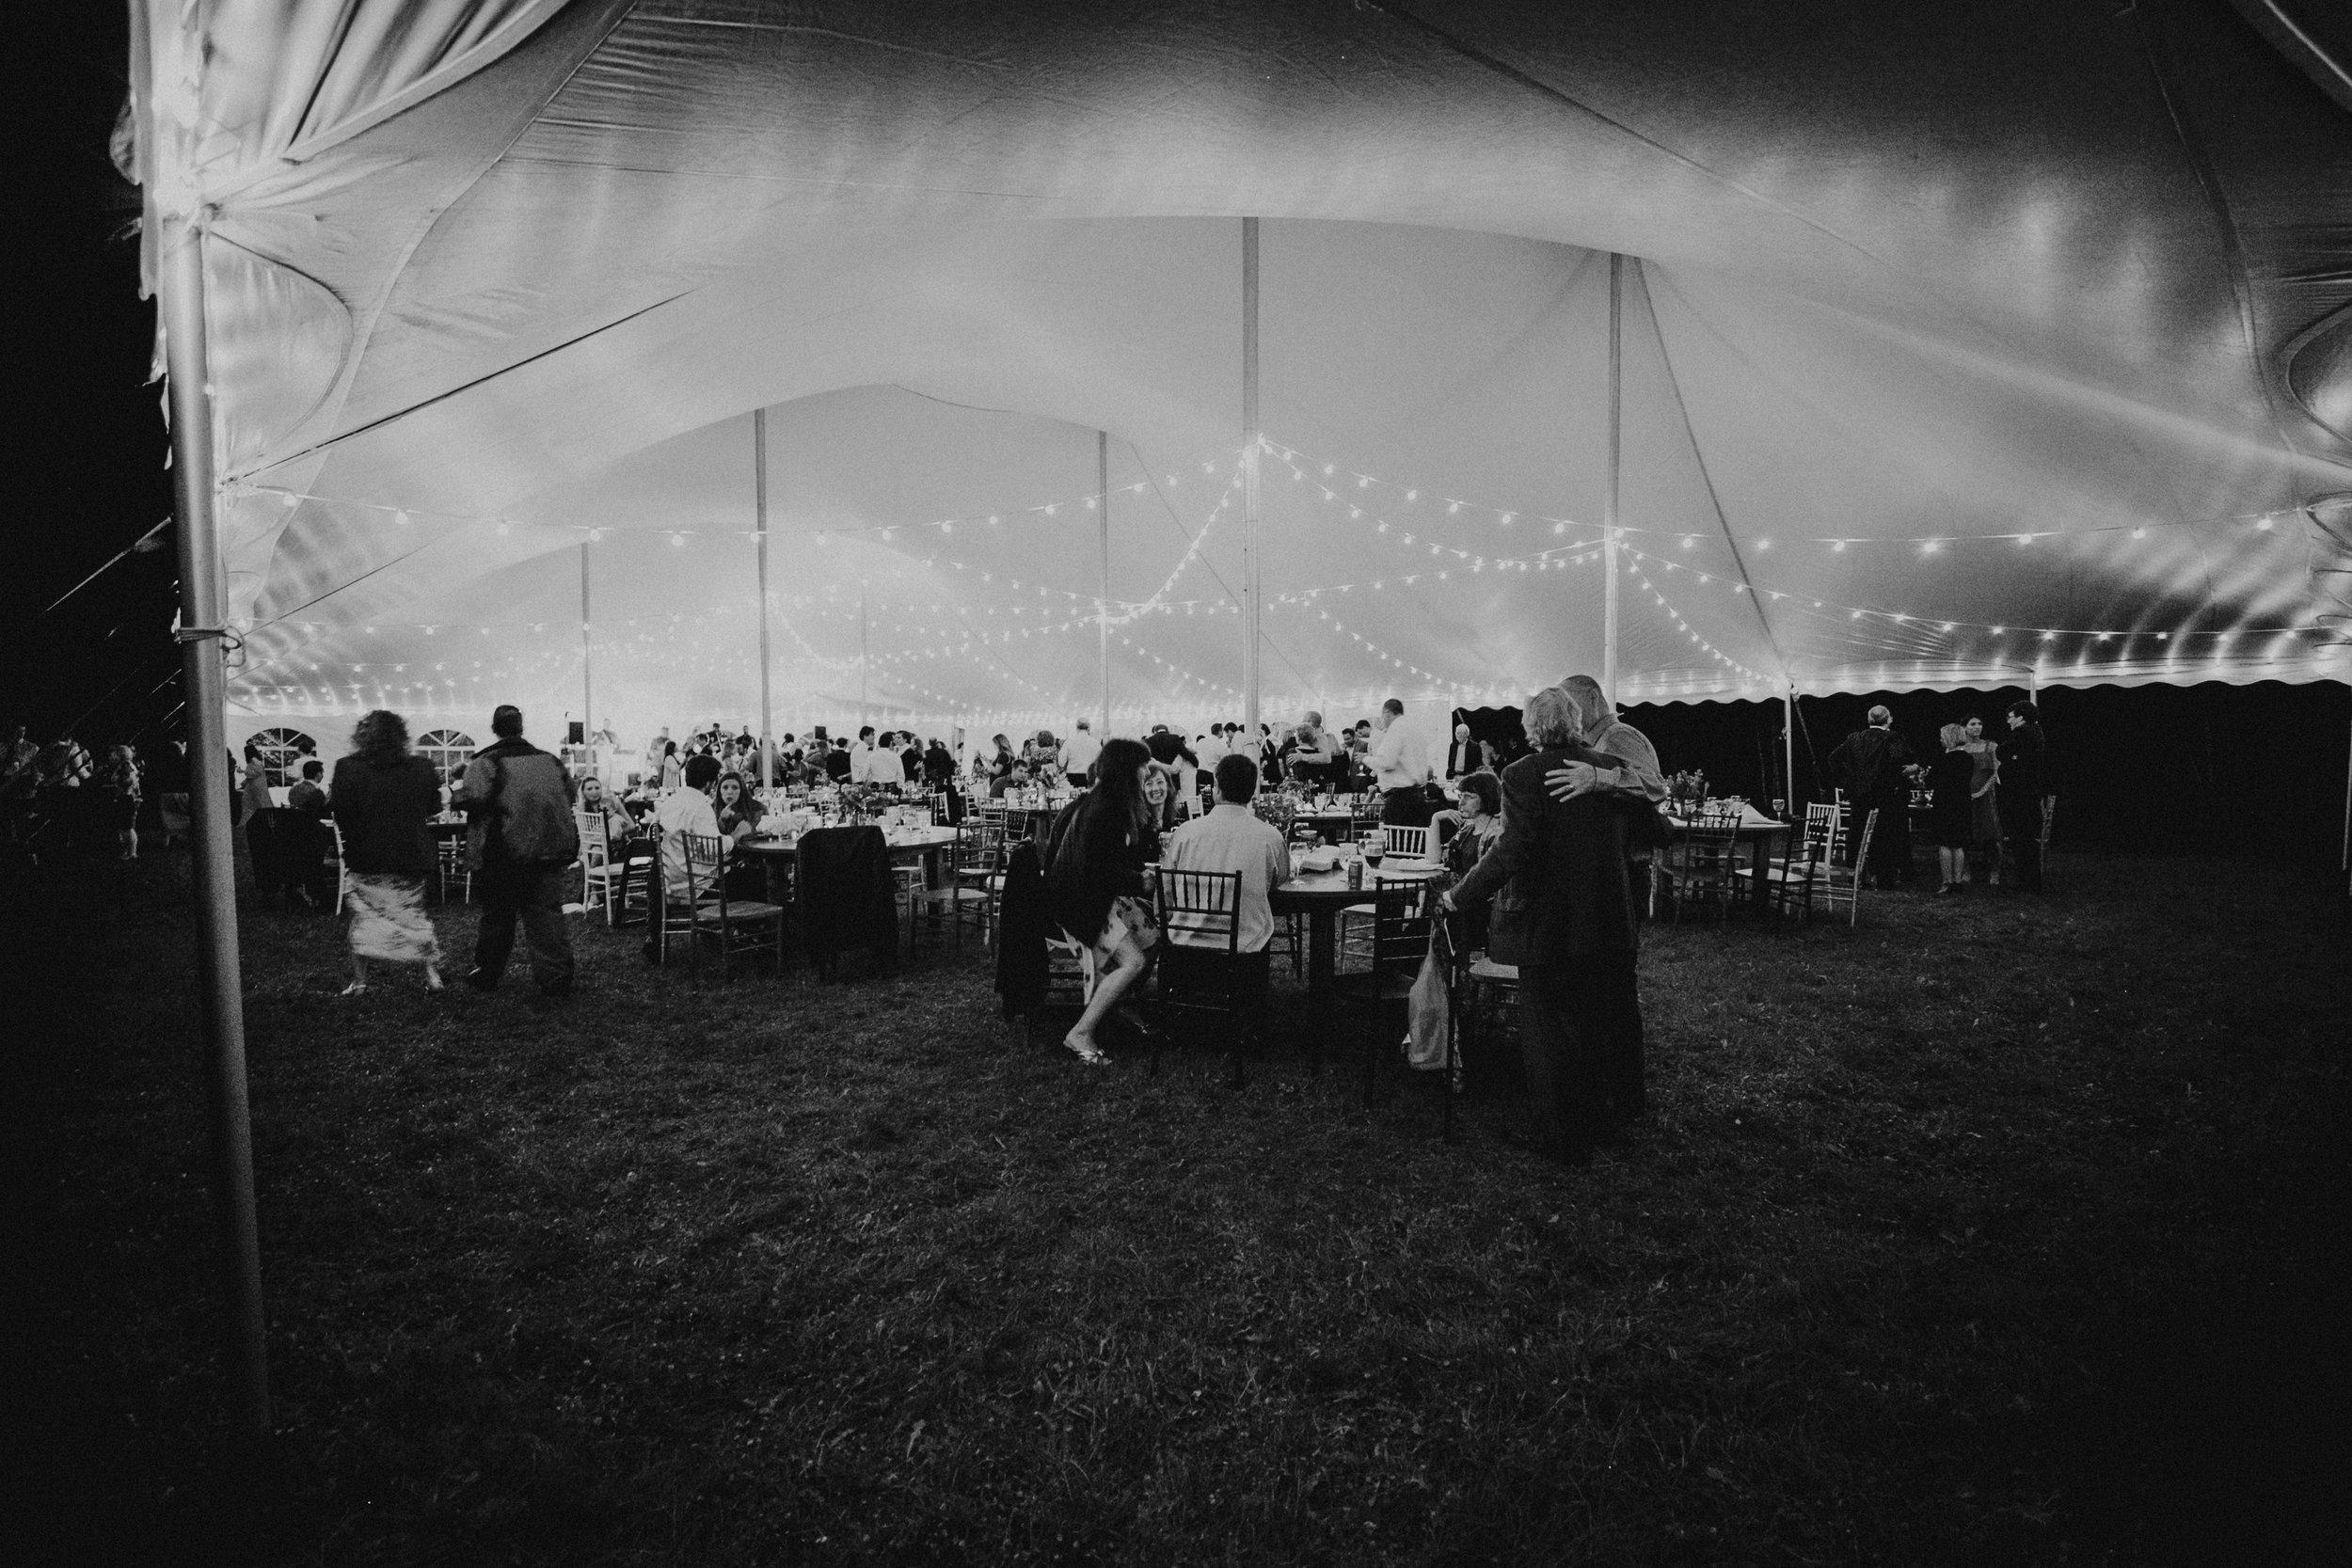 DEER_MOUNTAIN_INN_WEDDING_CHELLISE_MICHAEL_PHOTOGRAPHY-1685.jpg